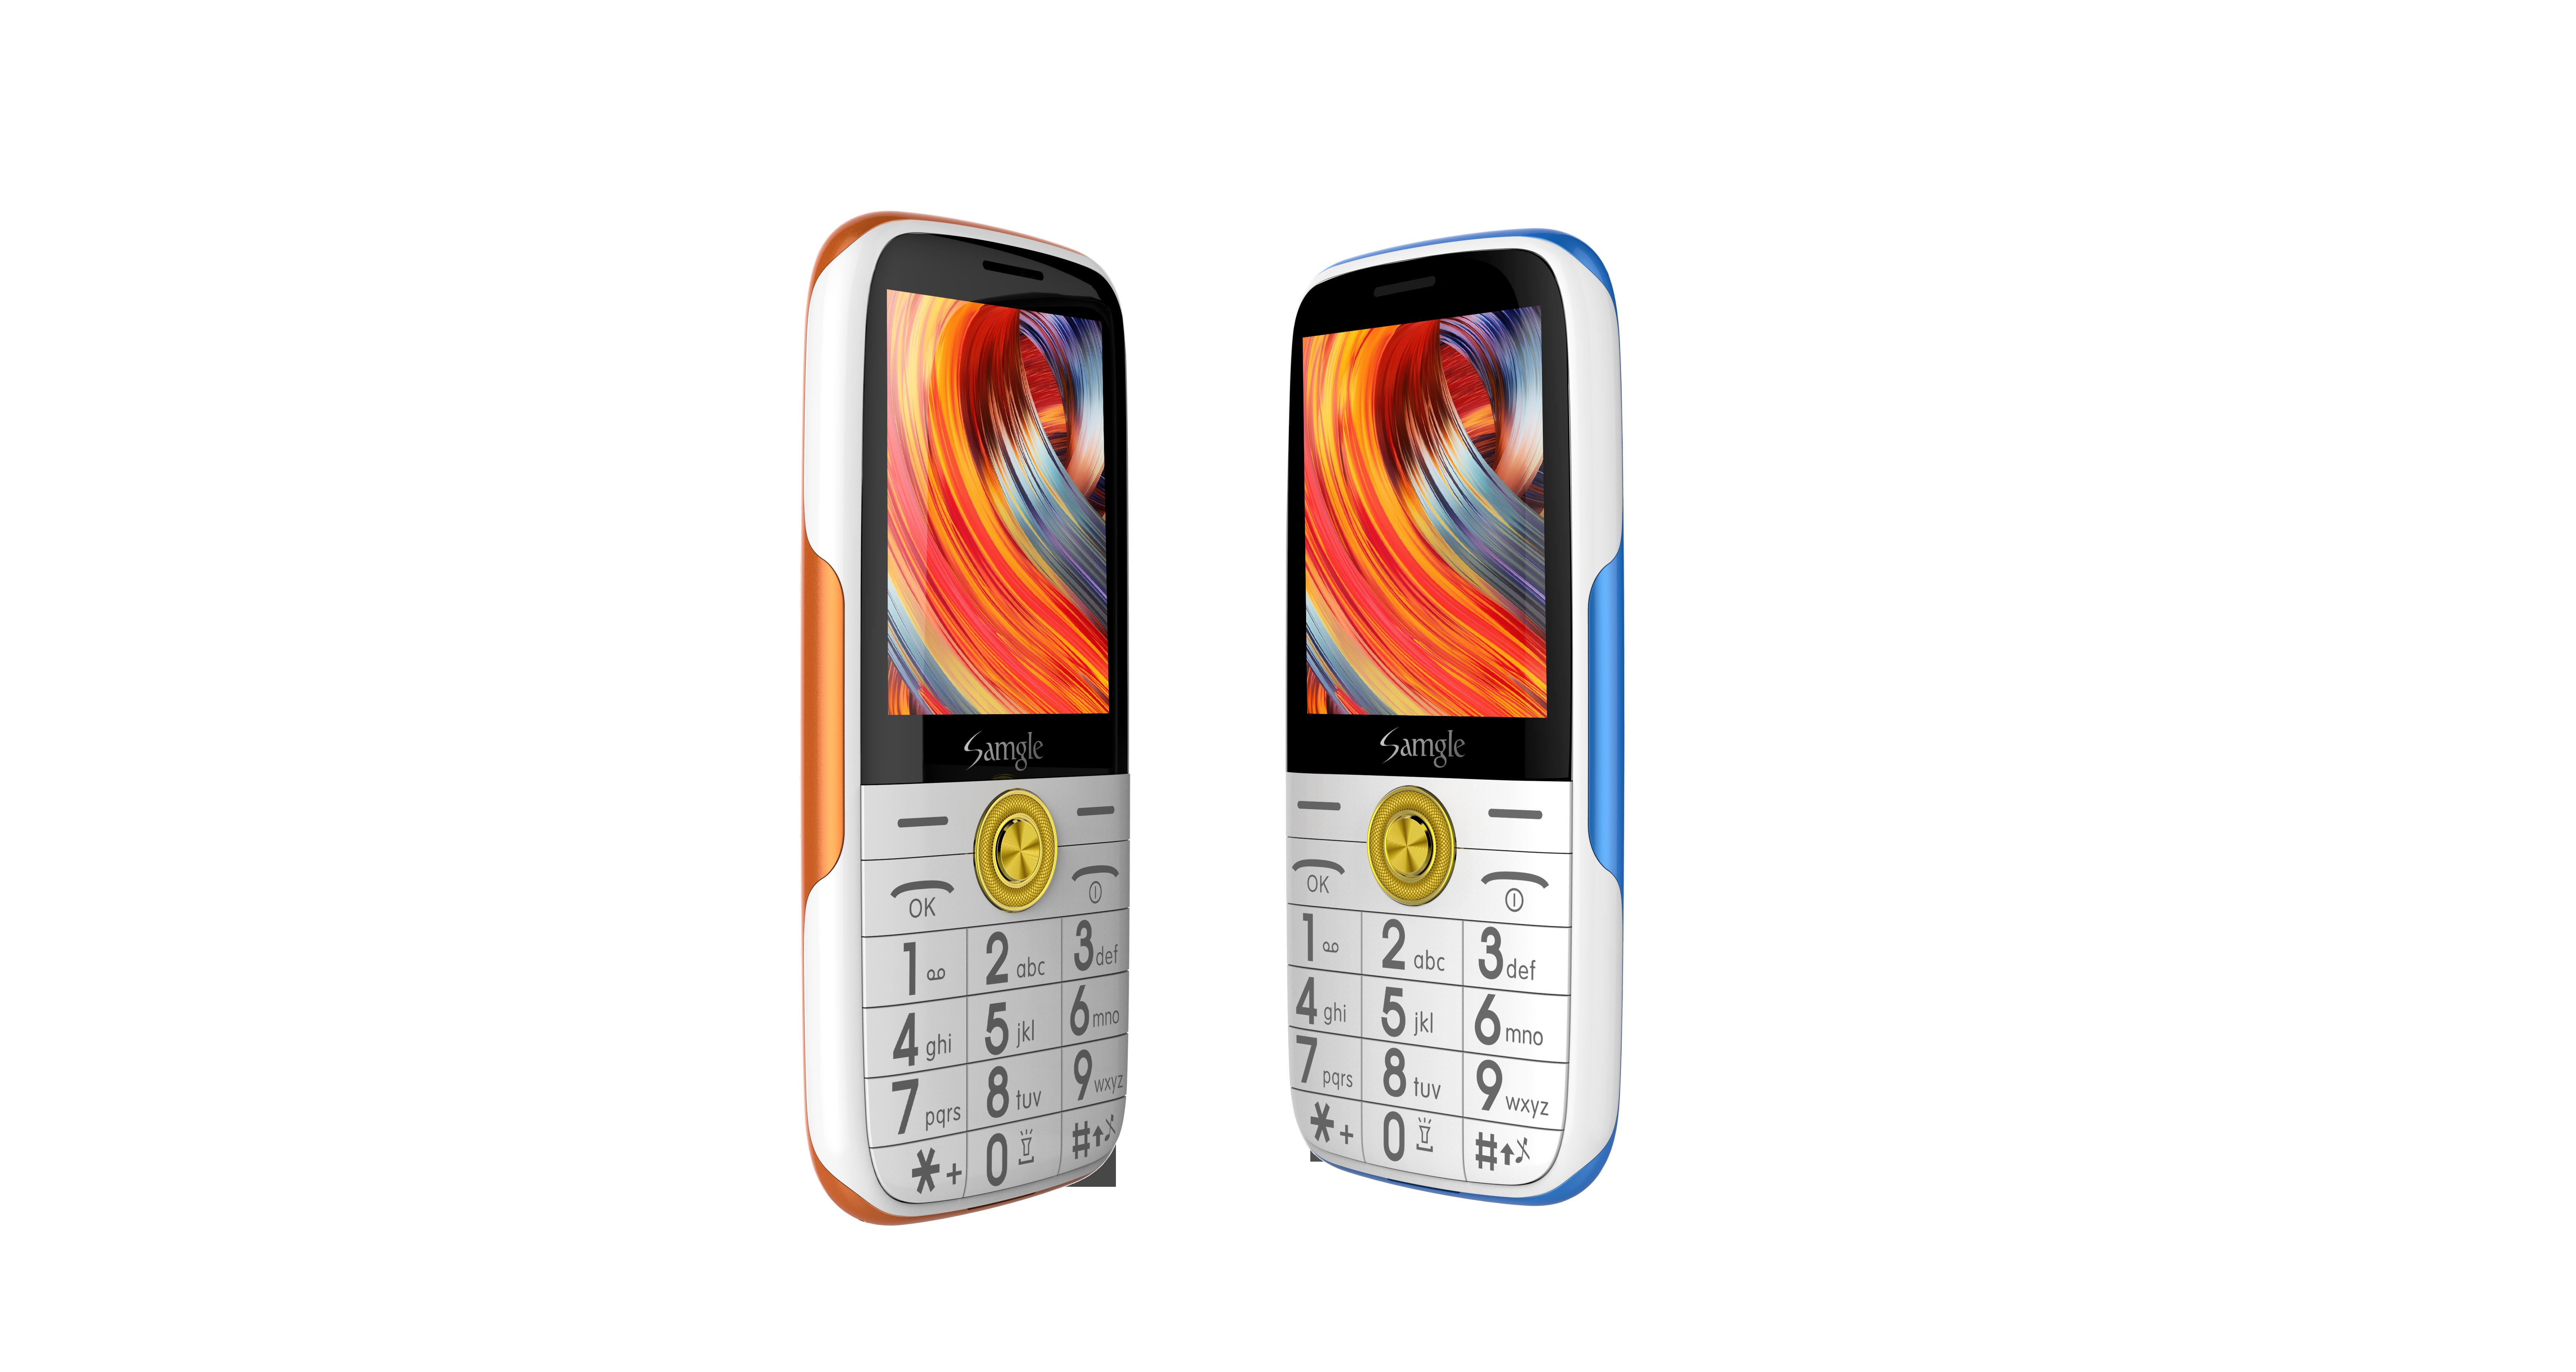 Telefon mobil Samgle Captain 3G, QVGA 2.4 inch, Bluetooth, Digi 3G, Camera, Slot Card, Radio FM, Internet, Dual SIM21